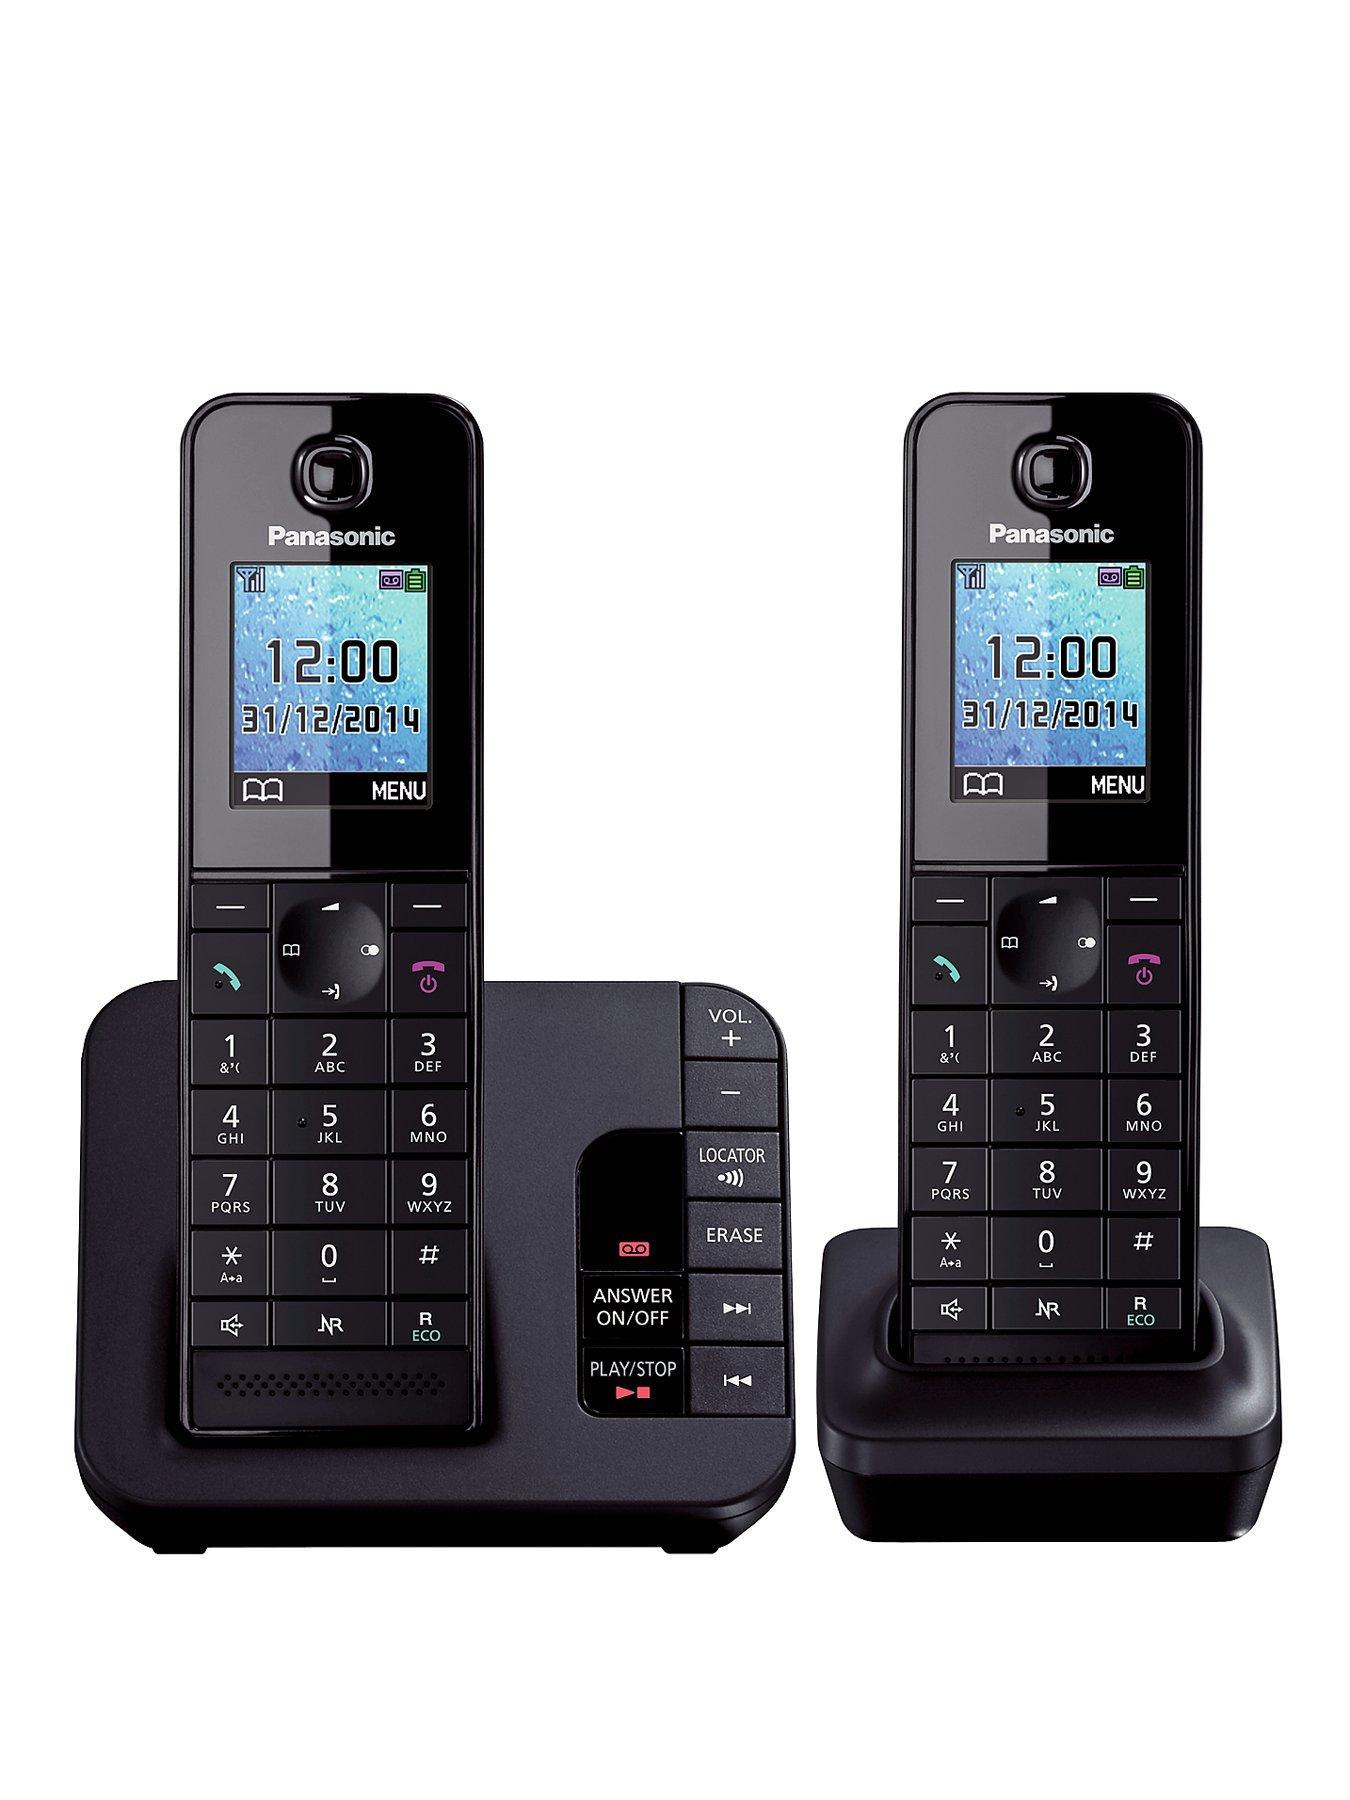 Panasonic TGH-222EB Cordless Telephone with Answering Machine - Twin